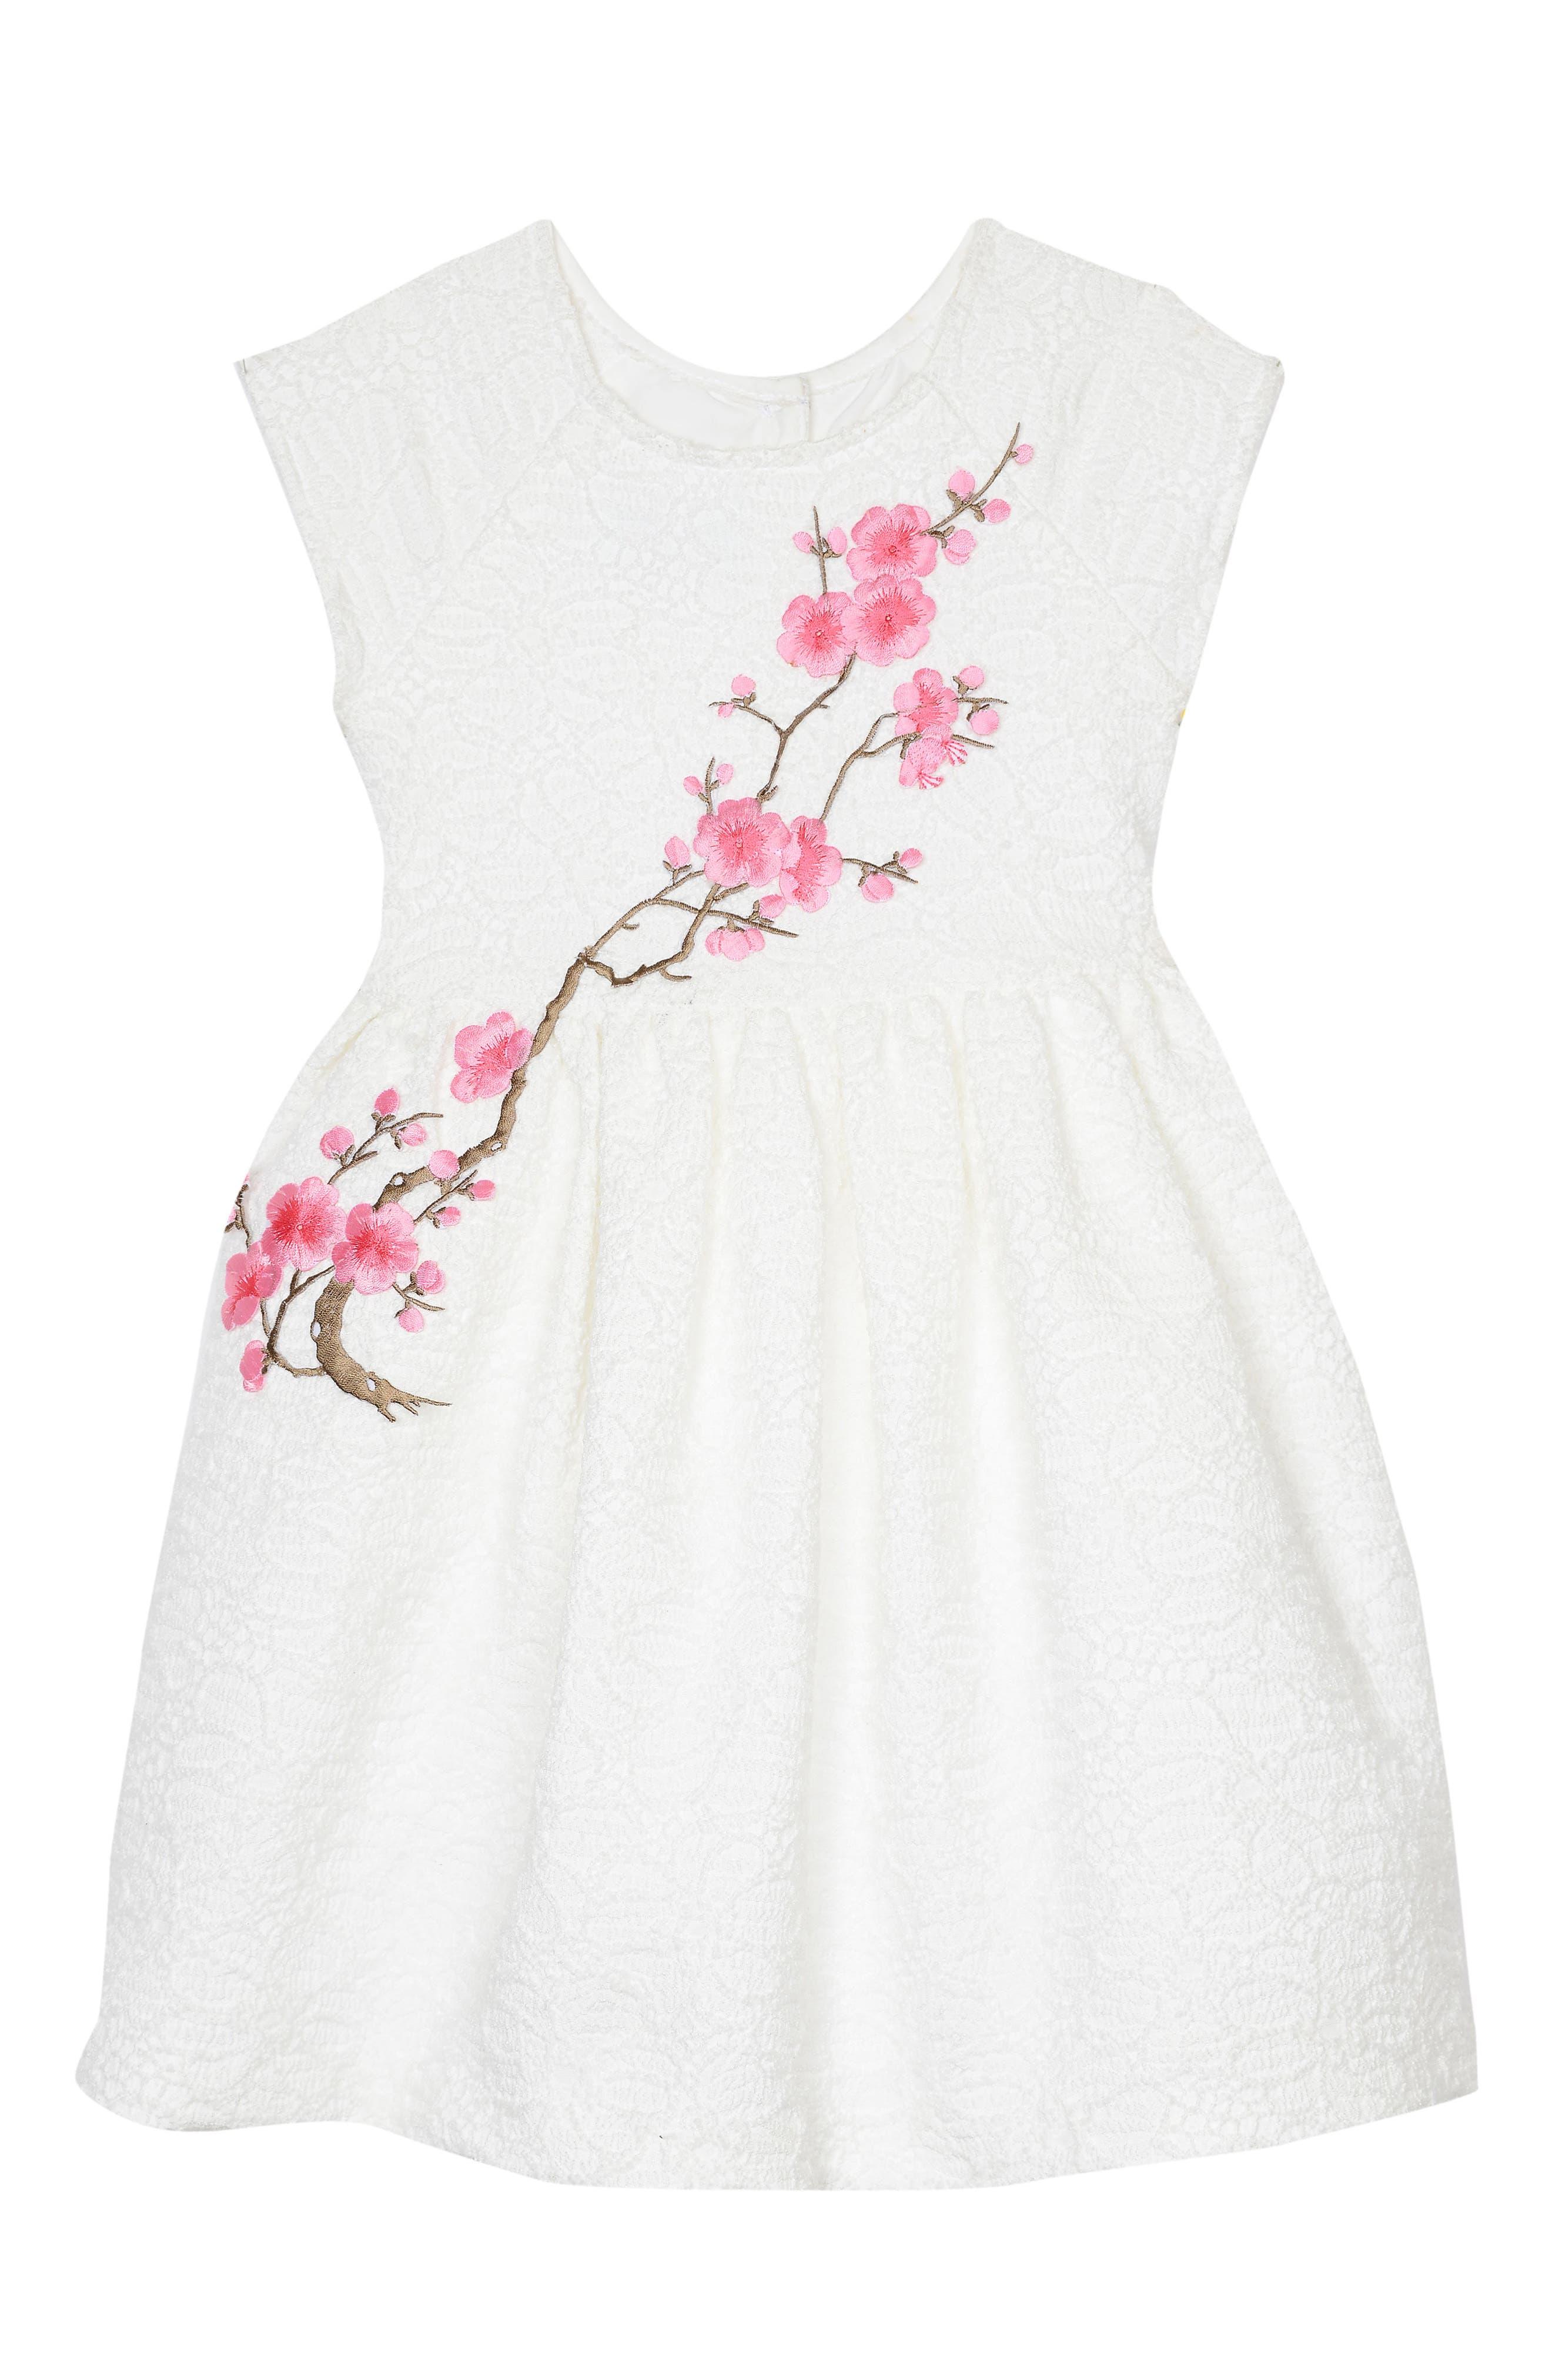 Cherry Blossom Dress,                             Main thumbnail 1, color,                             White